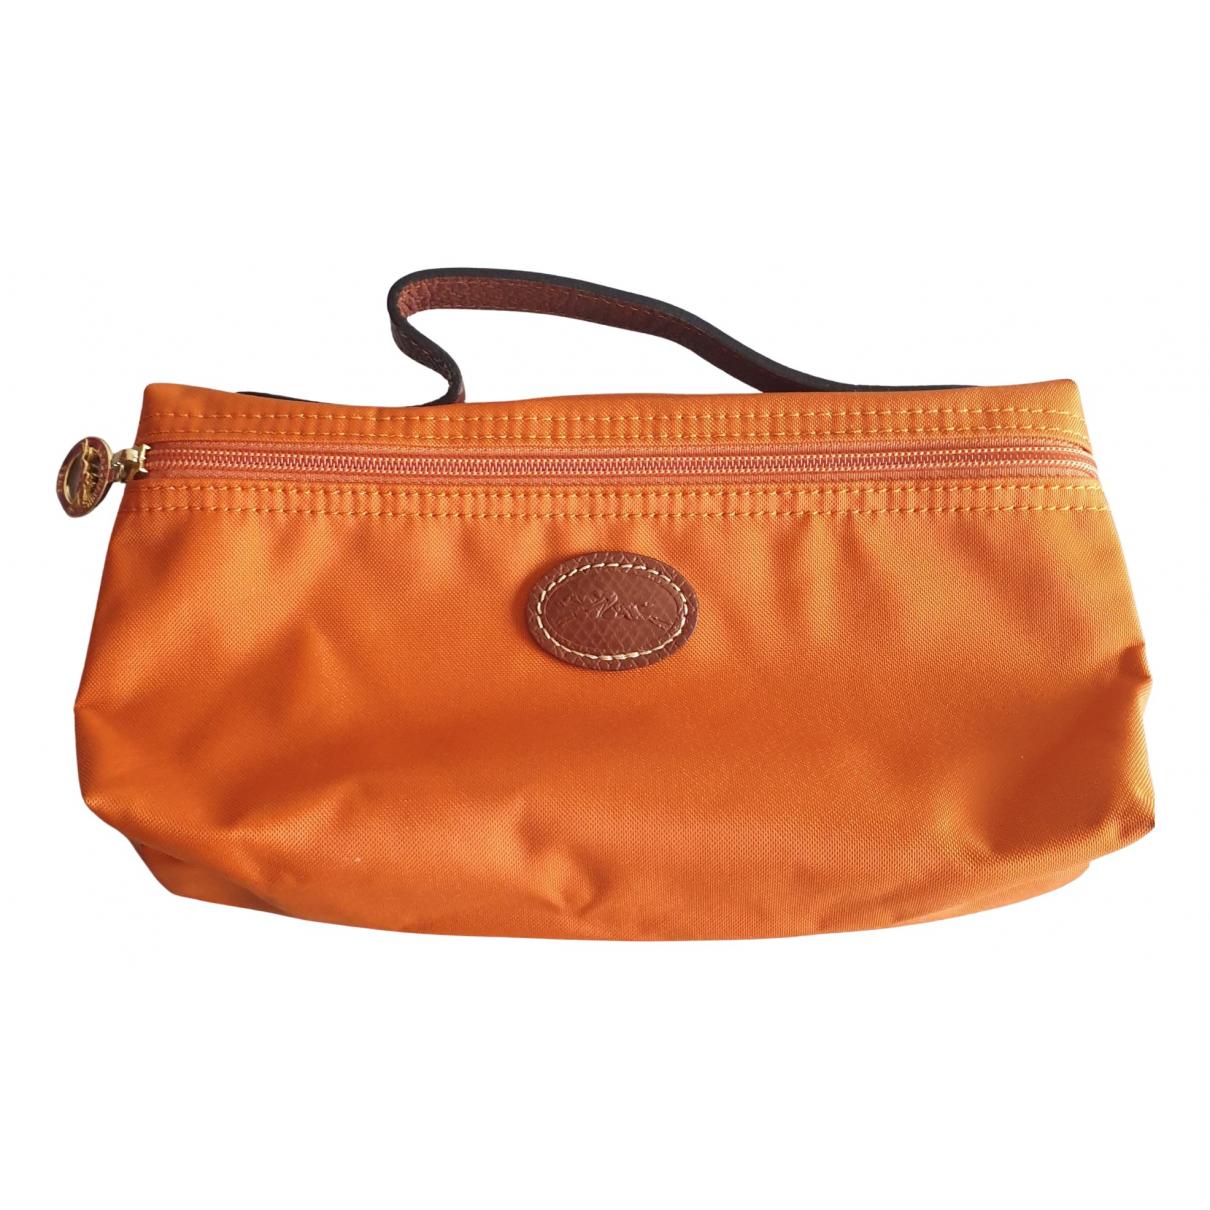 Longchamp N Orange Purses, wallet & cases for Women N